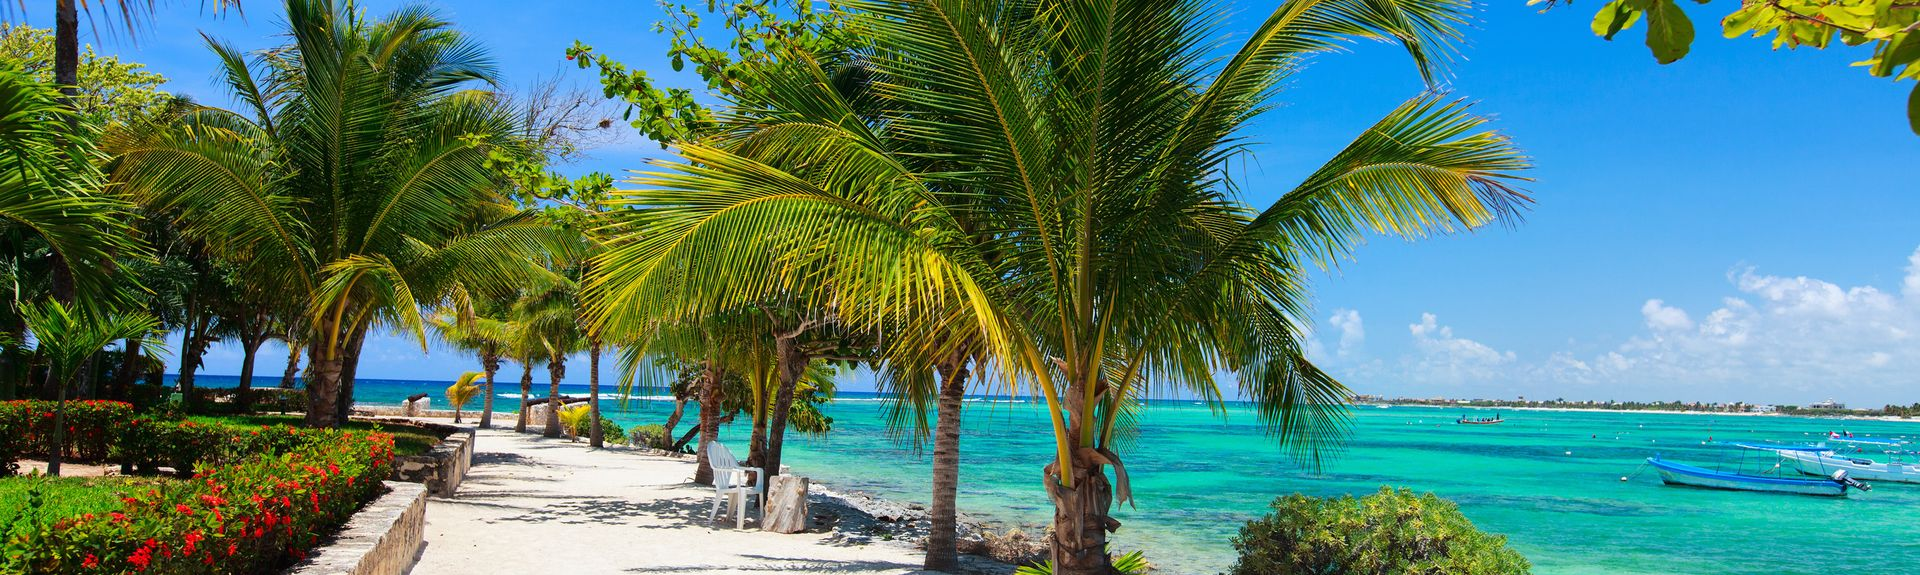 Akumal, Quintana Roo, Mexique